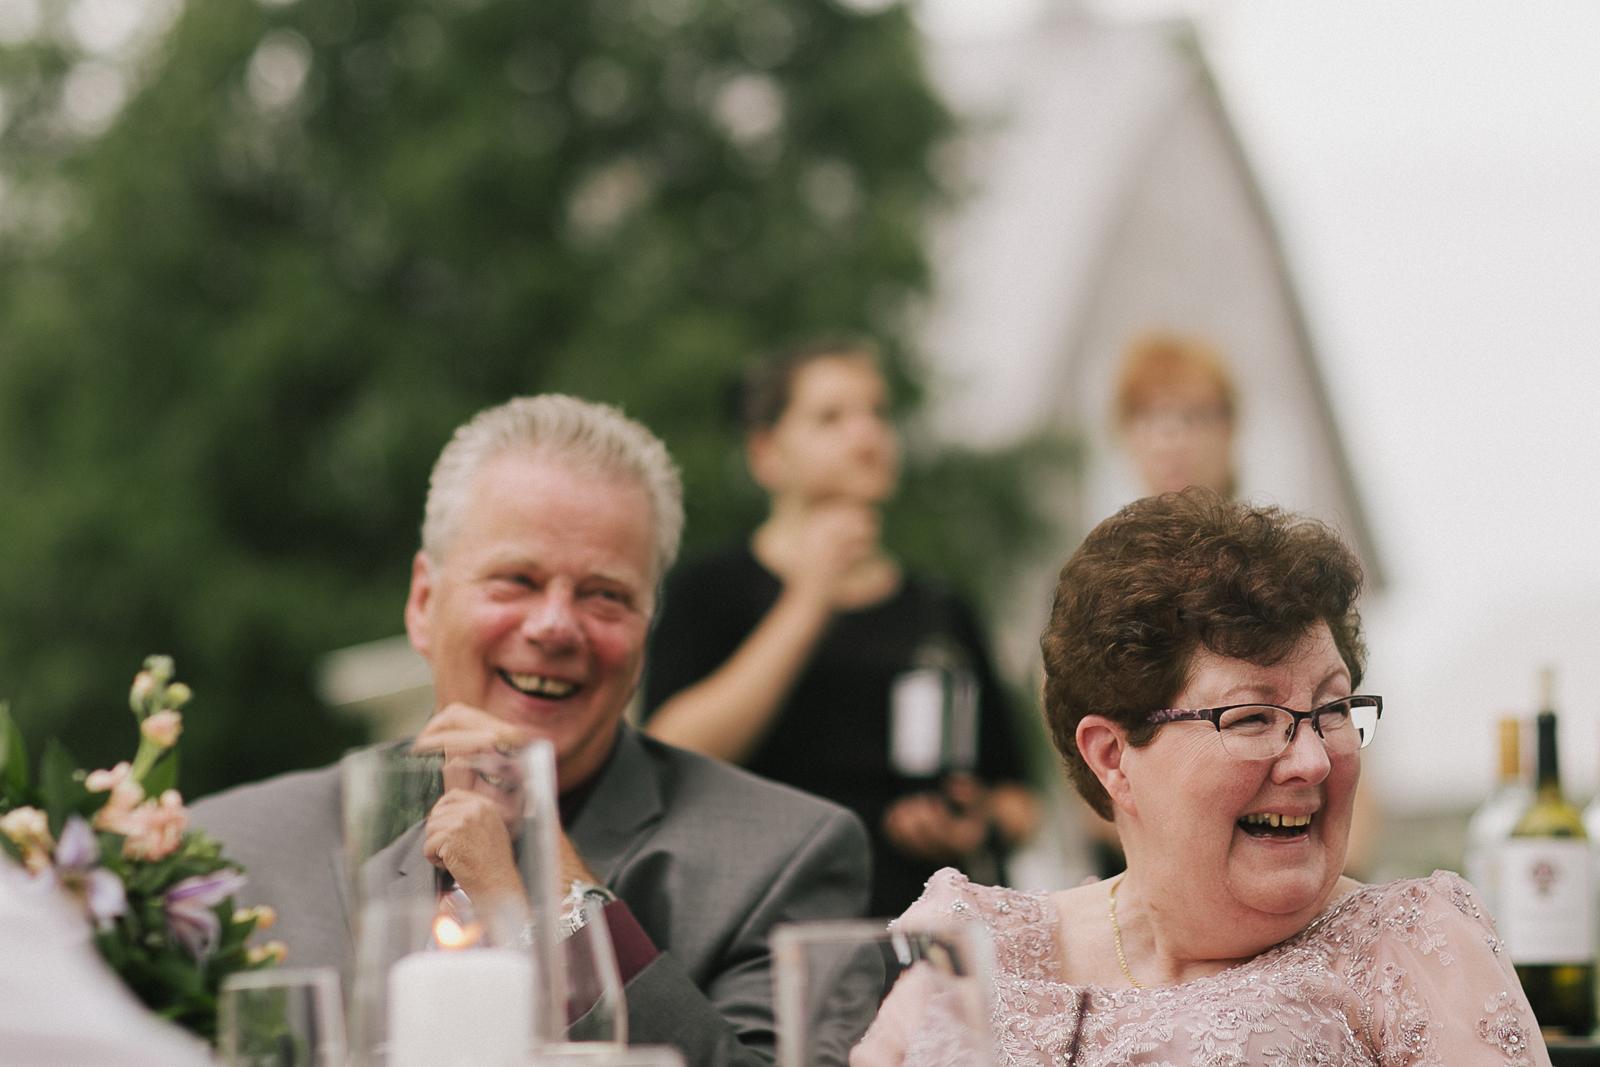 mike-and-jenni-wedding-454.jpg